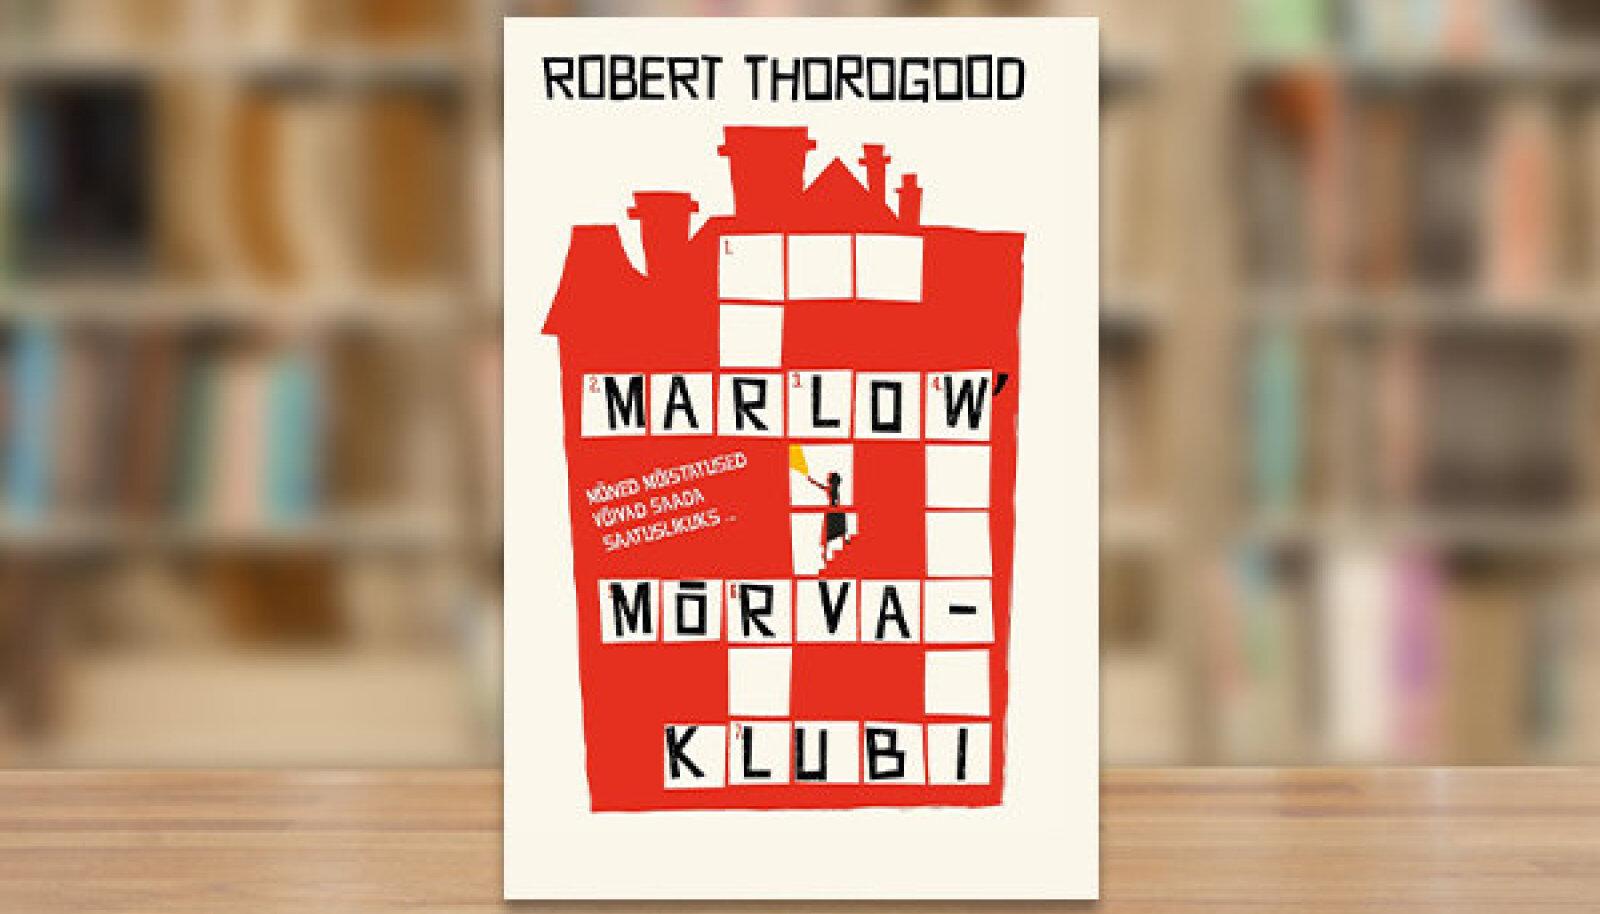 Marlow' mõrvaklubi.